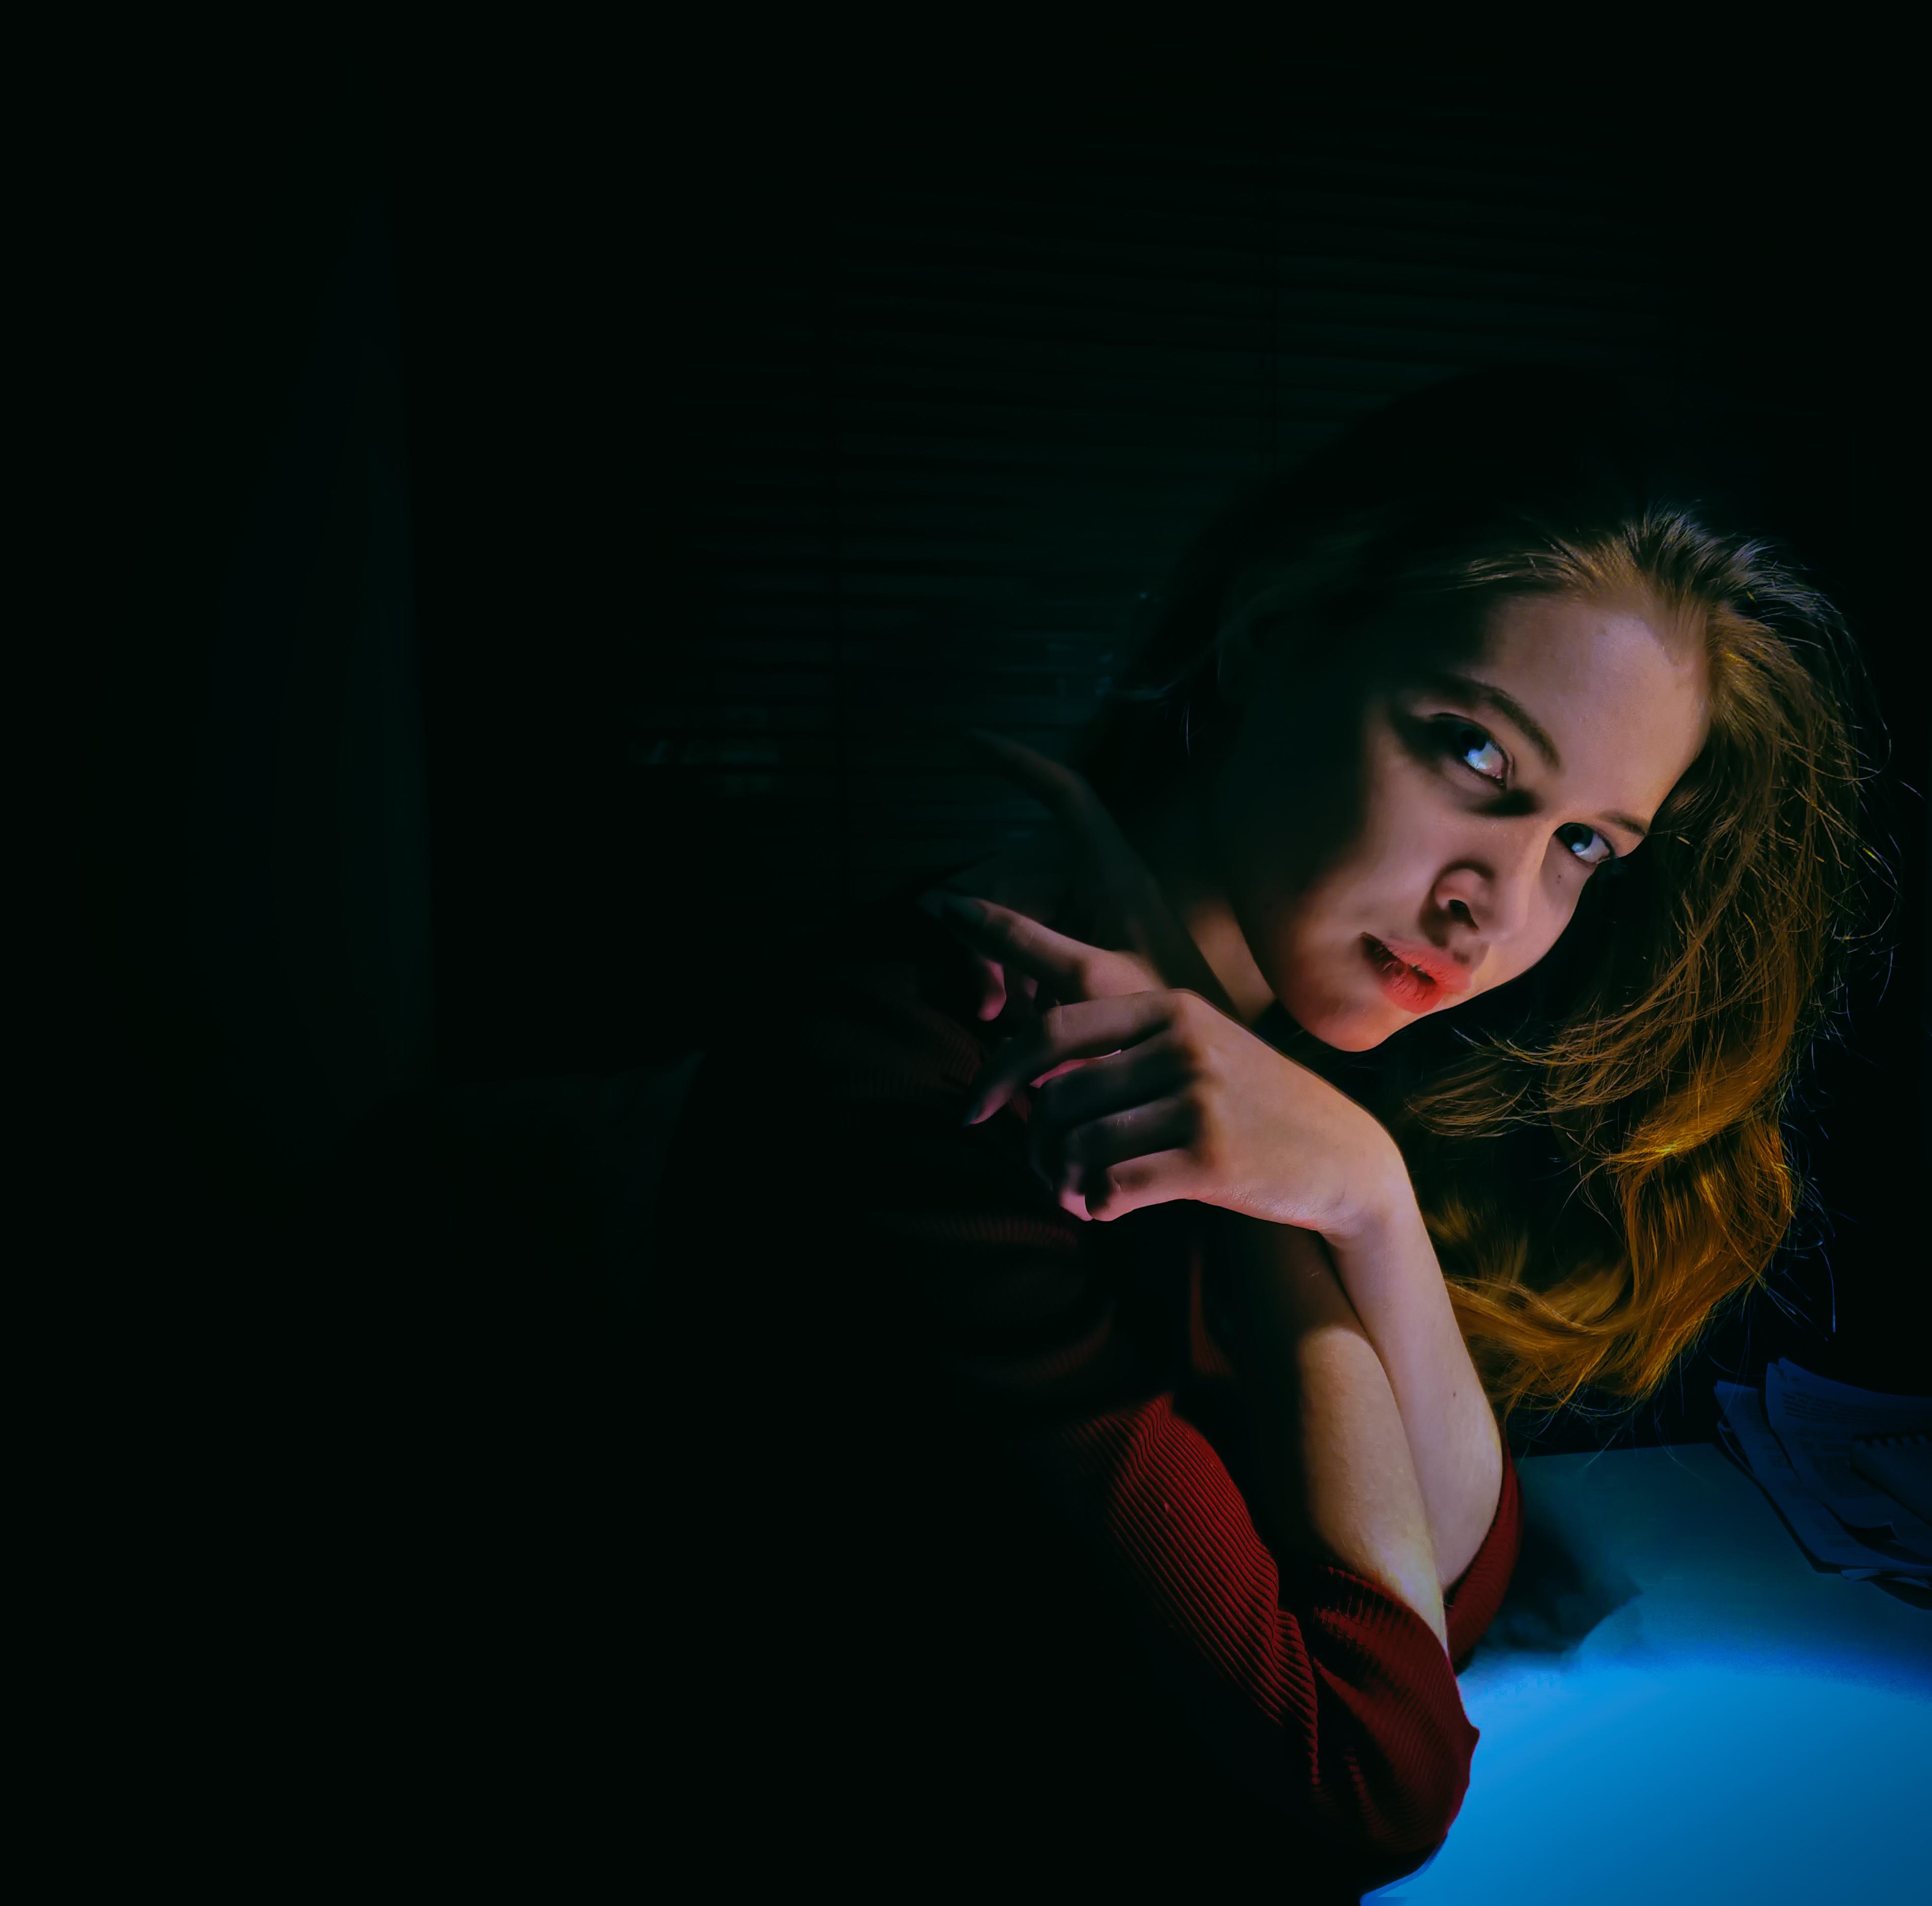 Gambar Gadis Wanita Model Merah Kegelapan Keindahan Pemotretan Fotografi Potret Komputer Wallpaper 3795x3743 1398118 Galeri Foto Pxhere